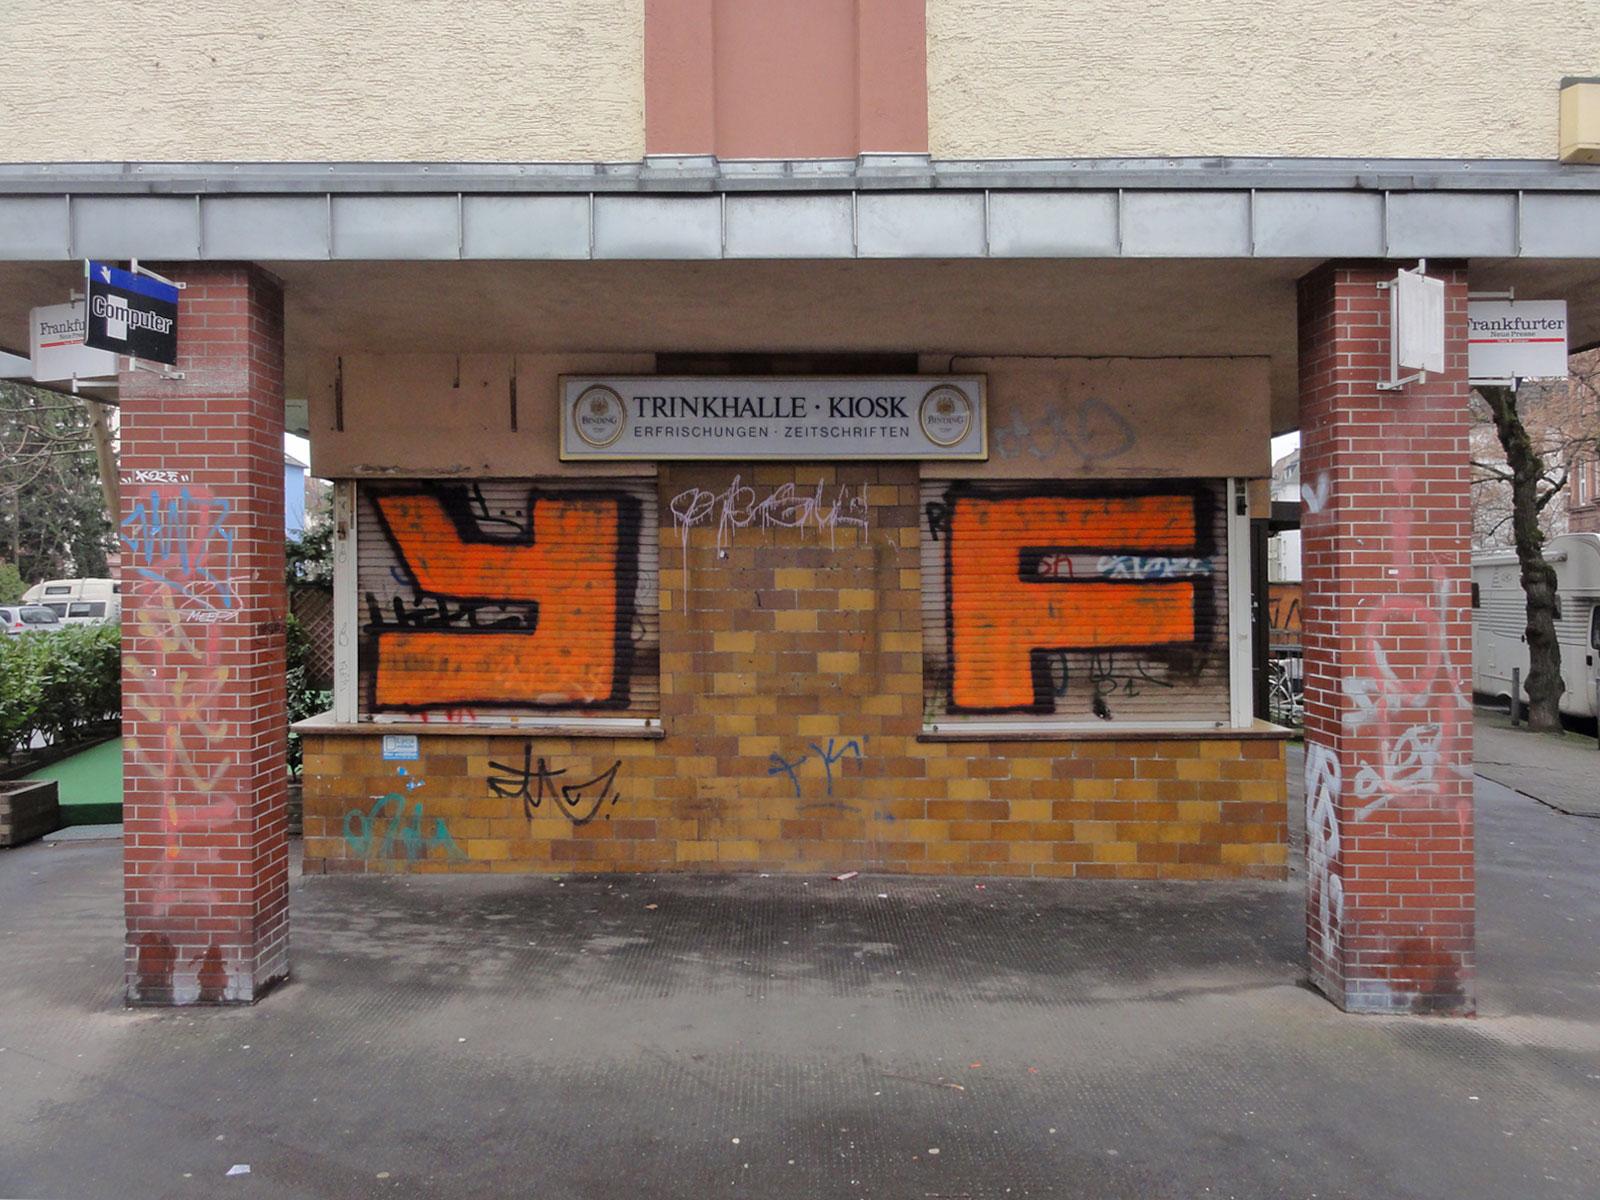 Graffiti in Frankfurt von YF